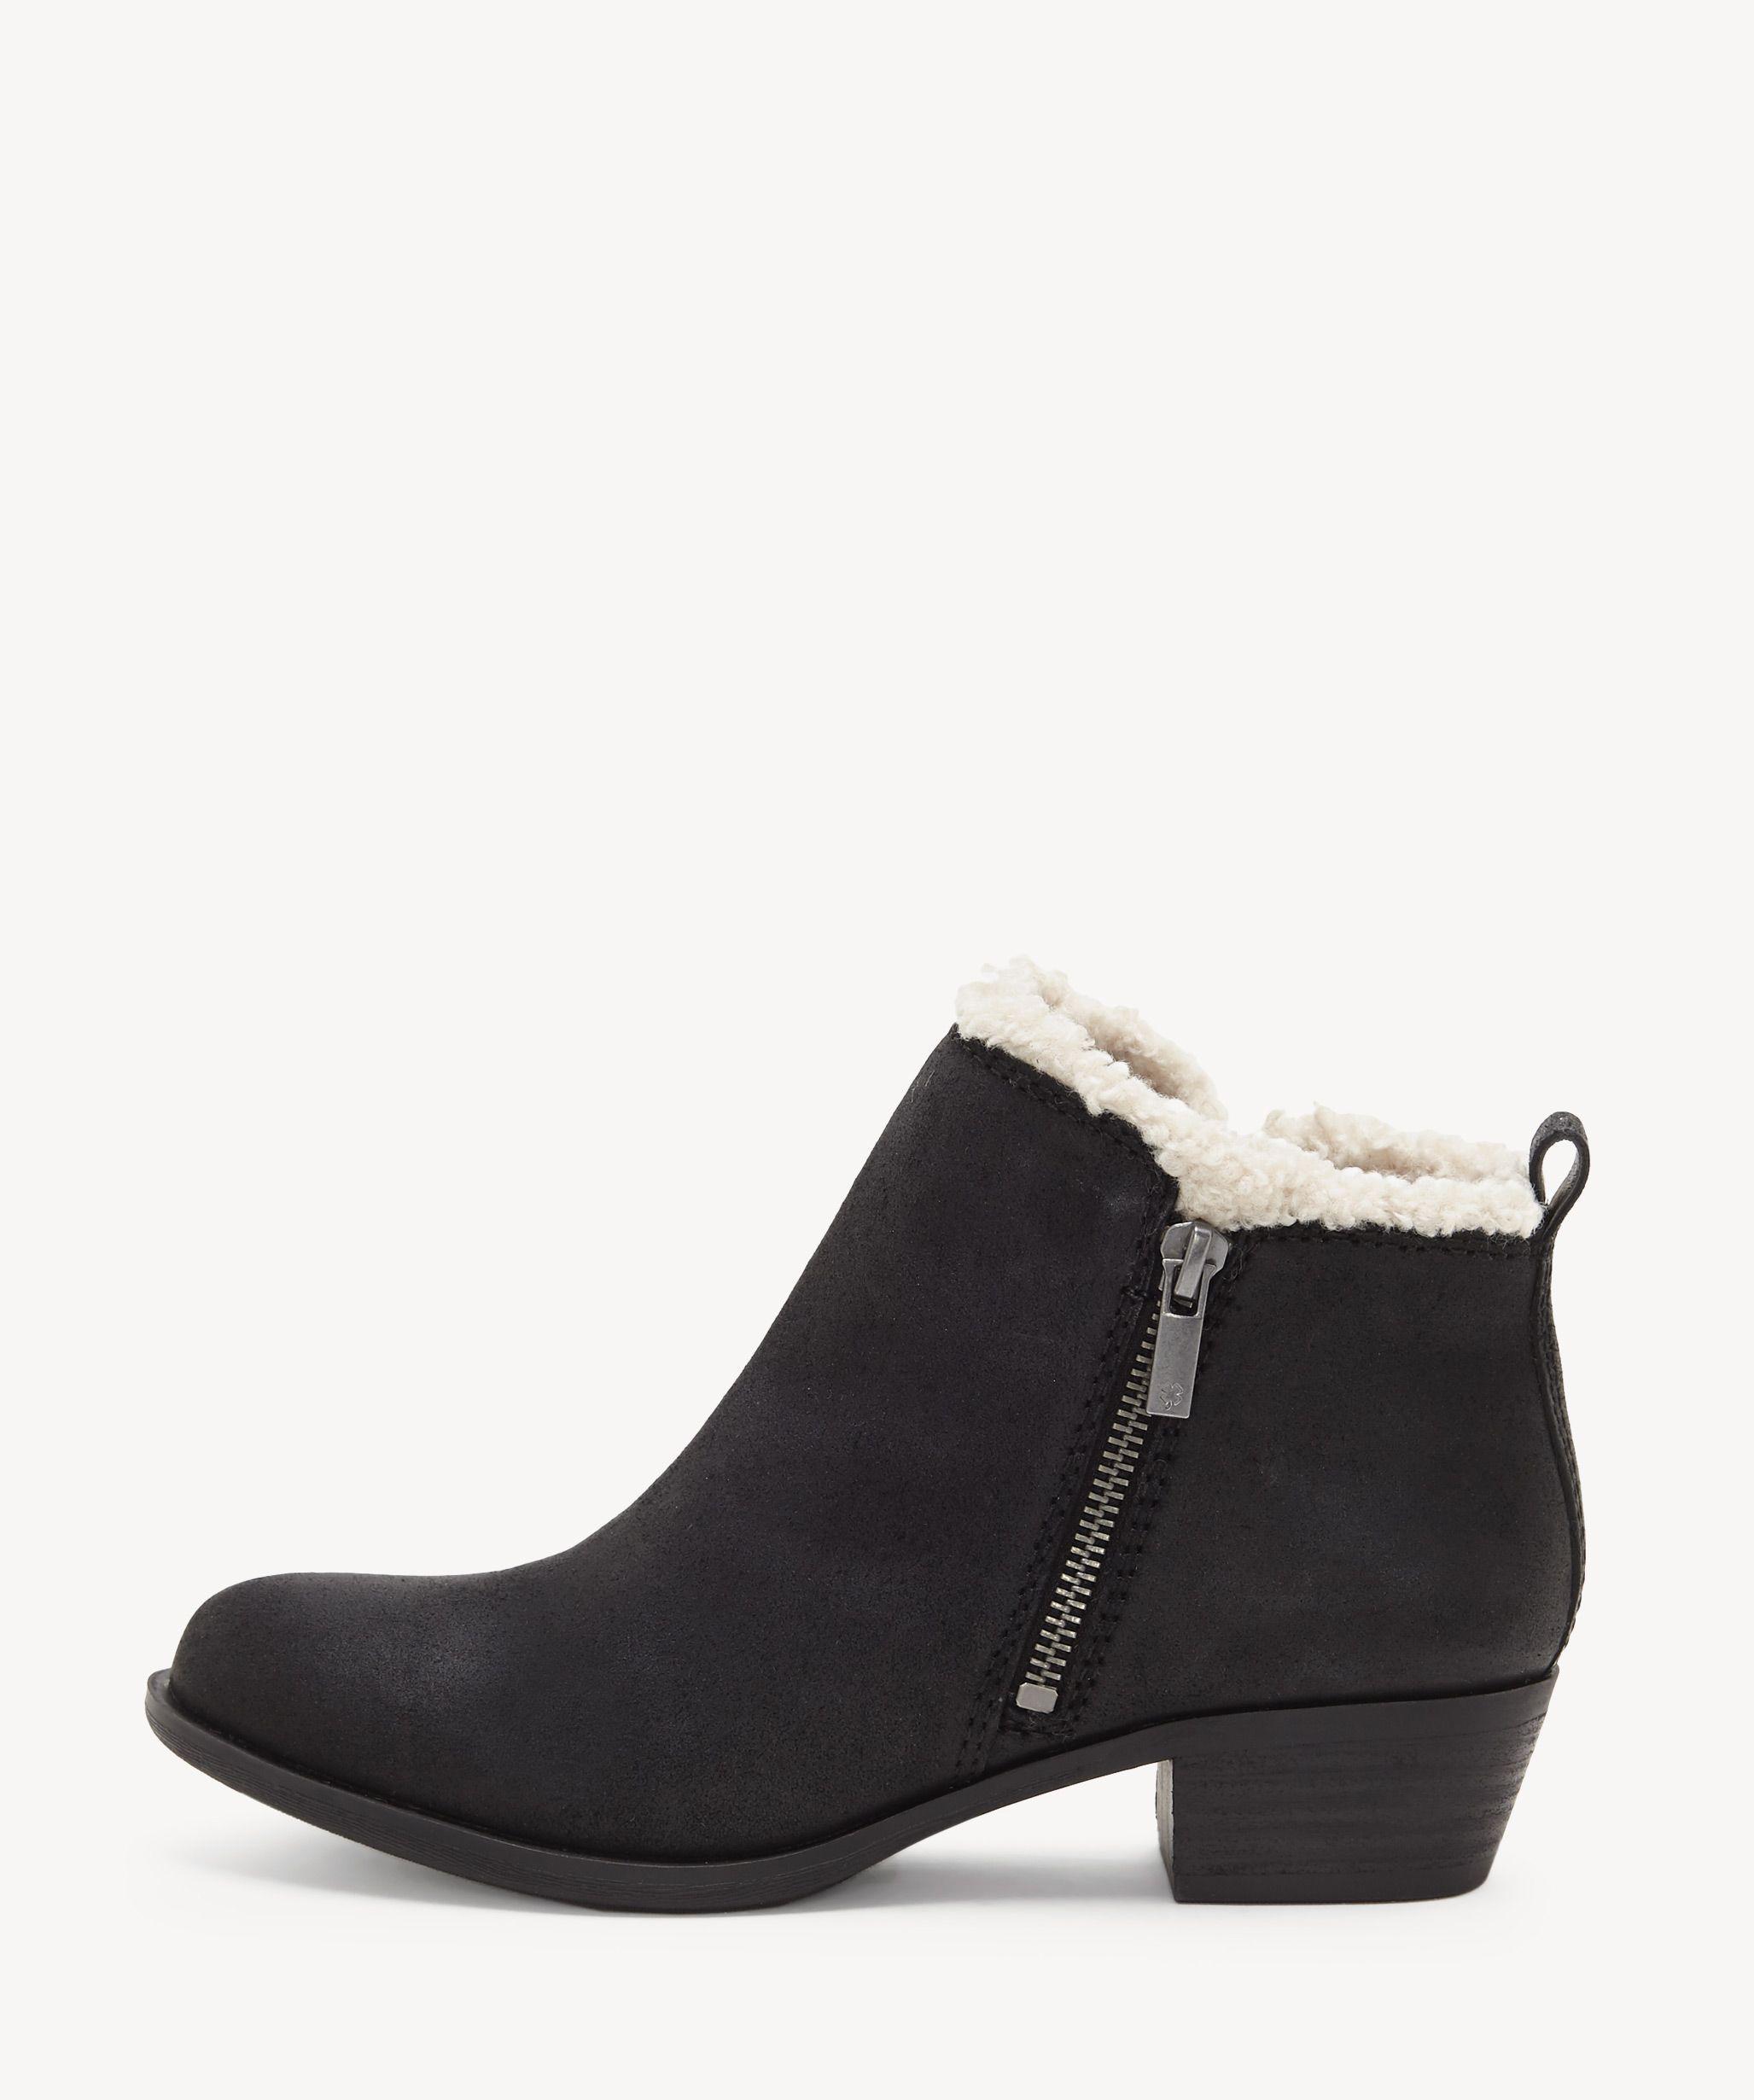 0305504cb69 Women's Black Baselsher Ankle Bootie